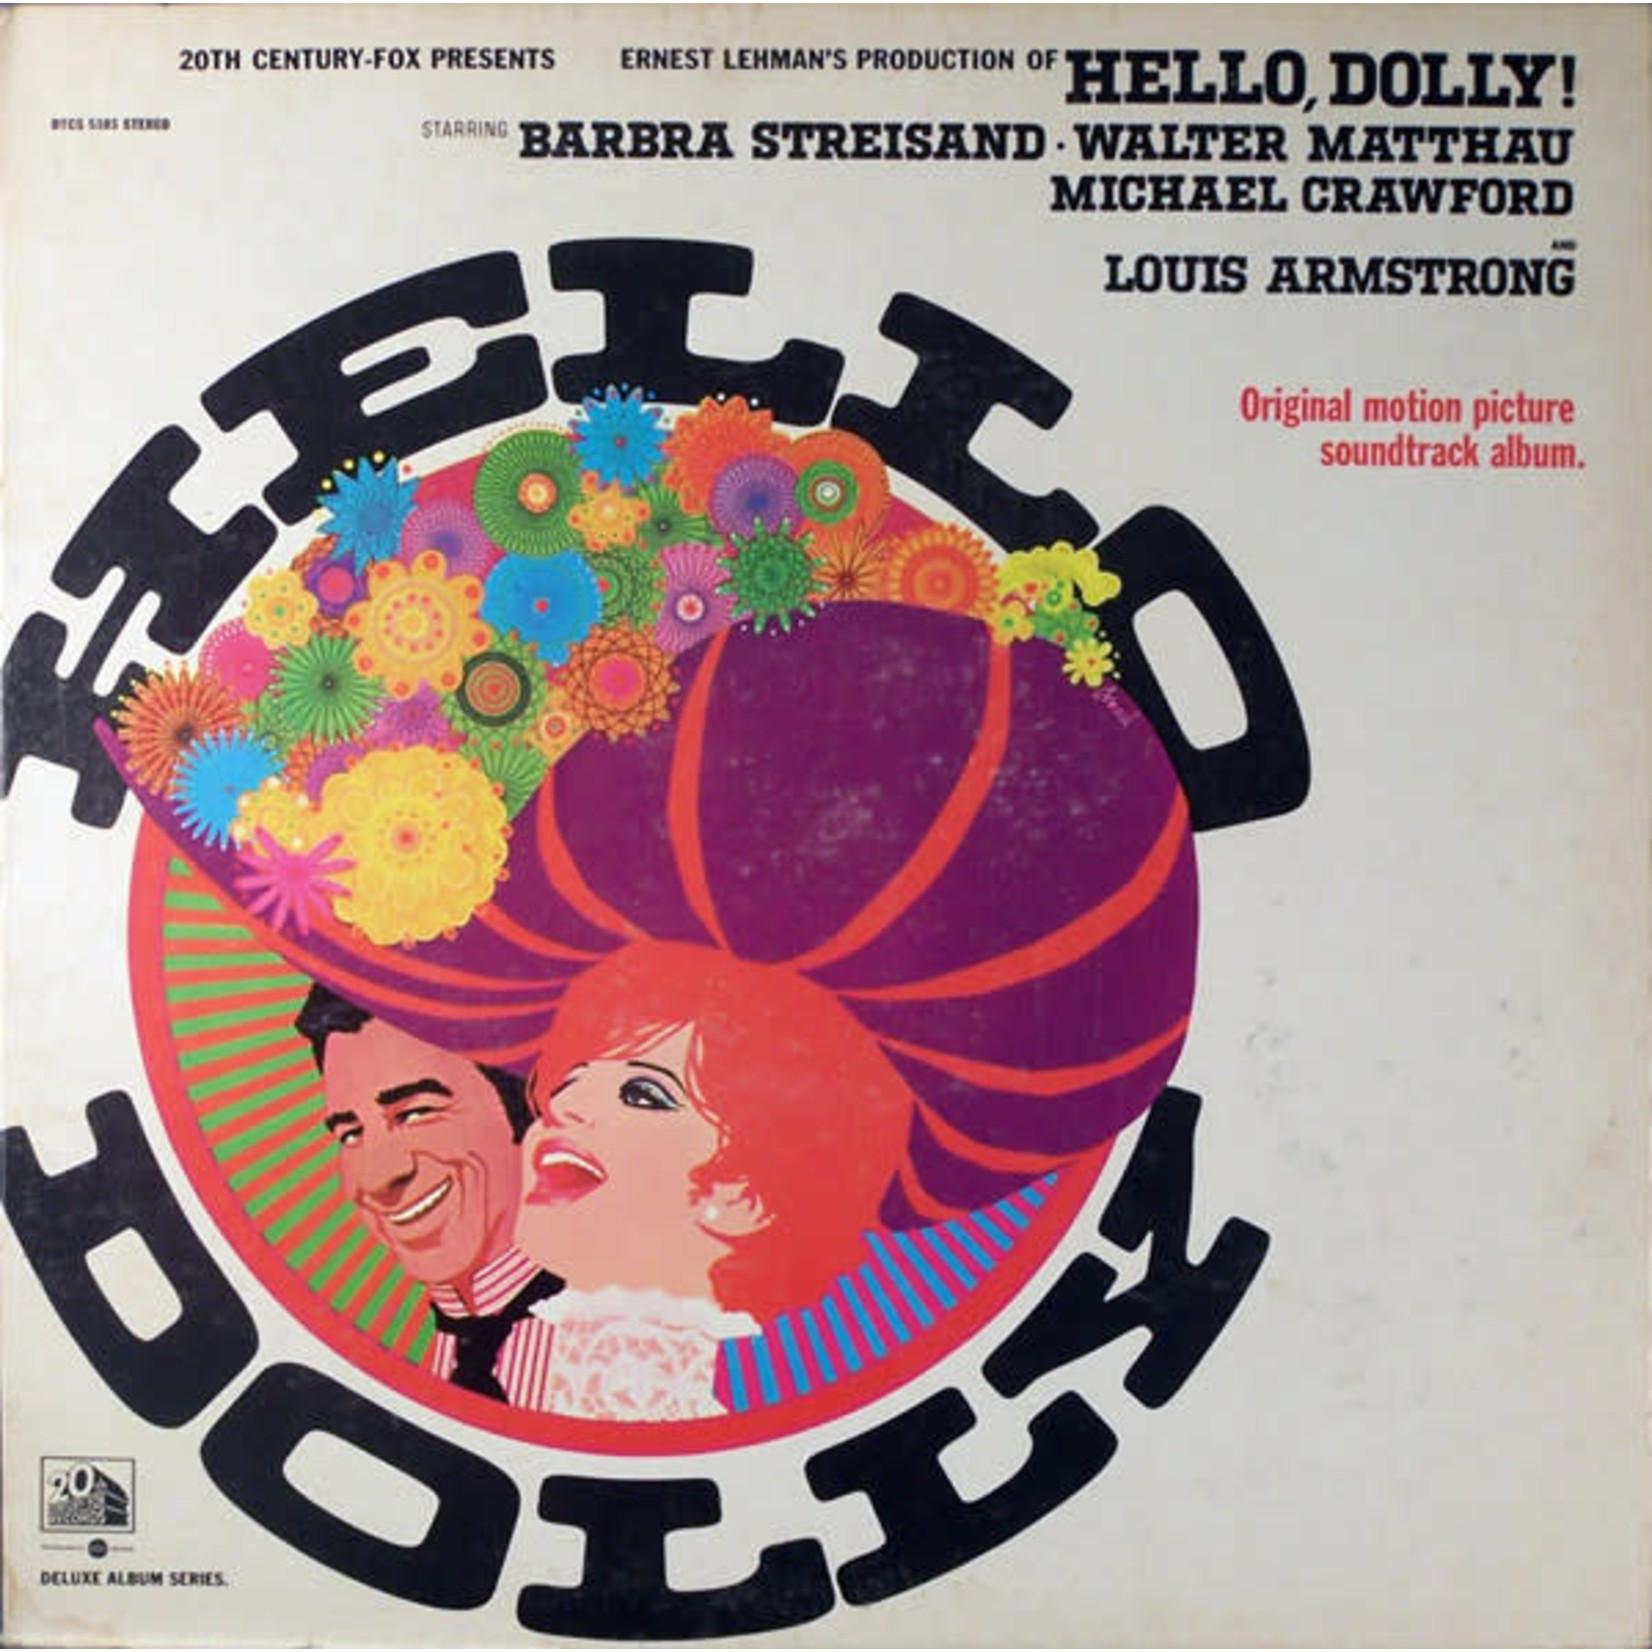 [Vintage] Various: Hello, Dolly! (starring Barbra Streisand) (Soundtrack)